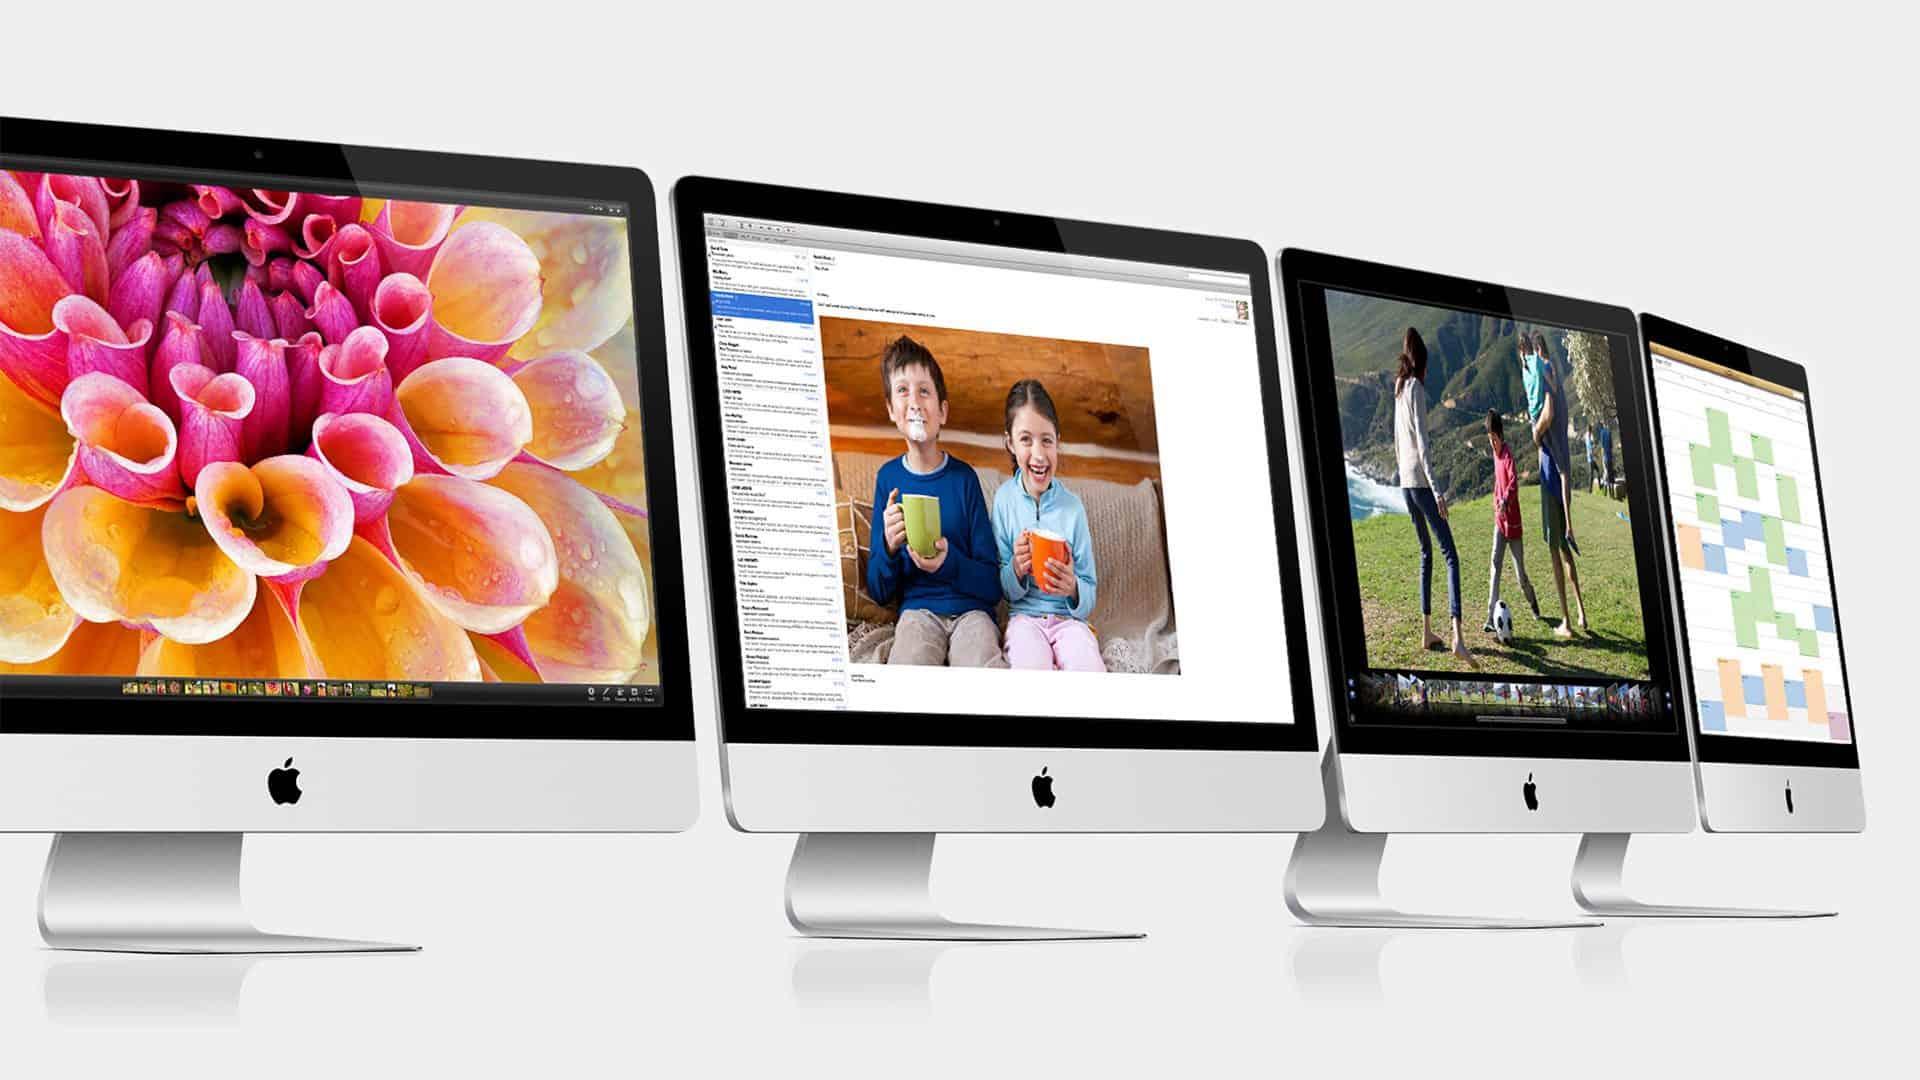 23″ Budget iMac coming soon, reports China Times